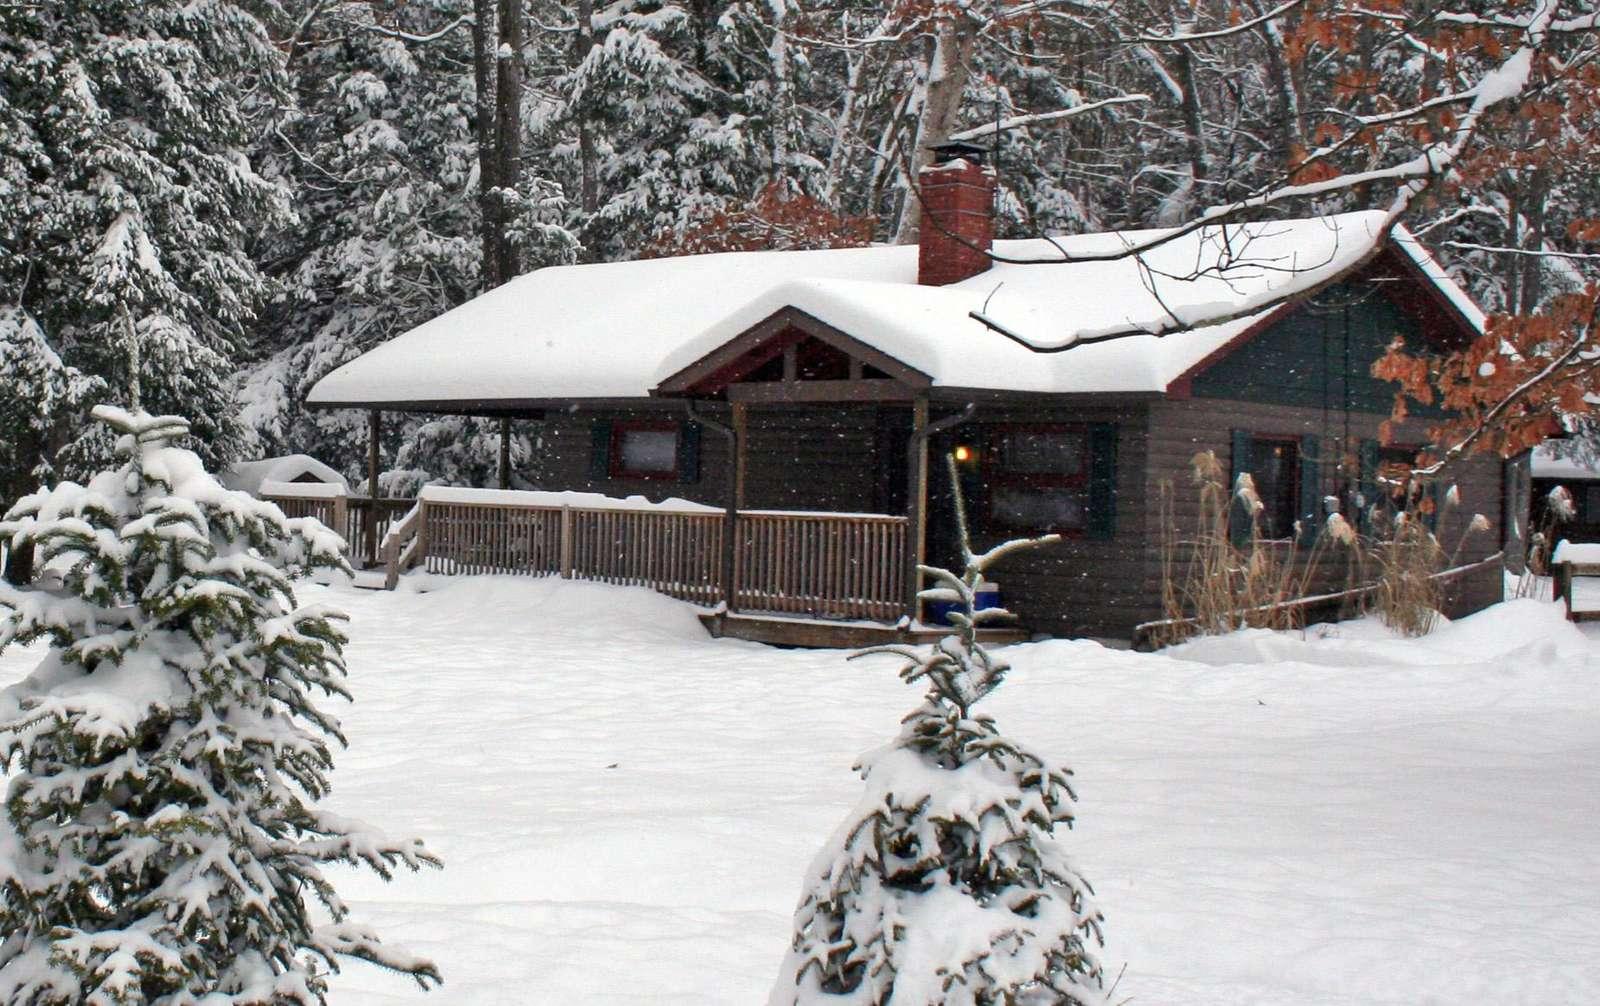 Buckeye Cabin - Snow - 12-30-12